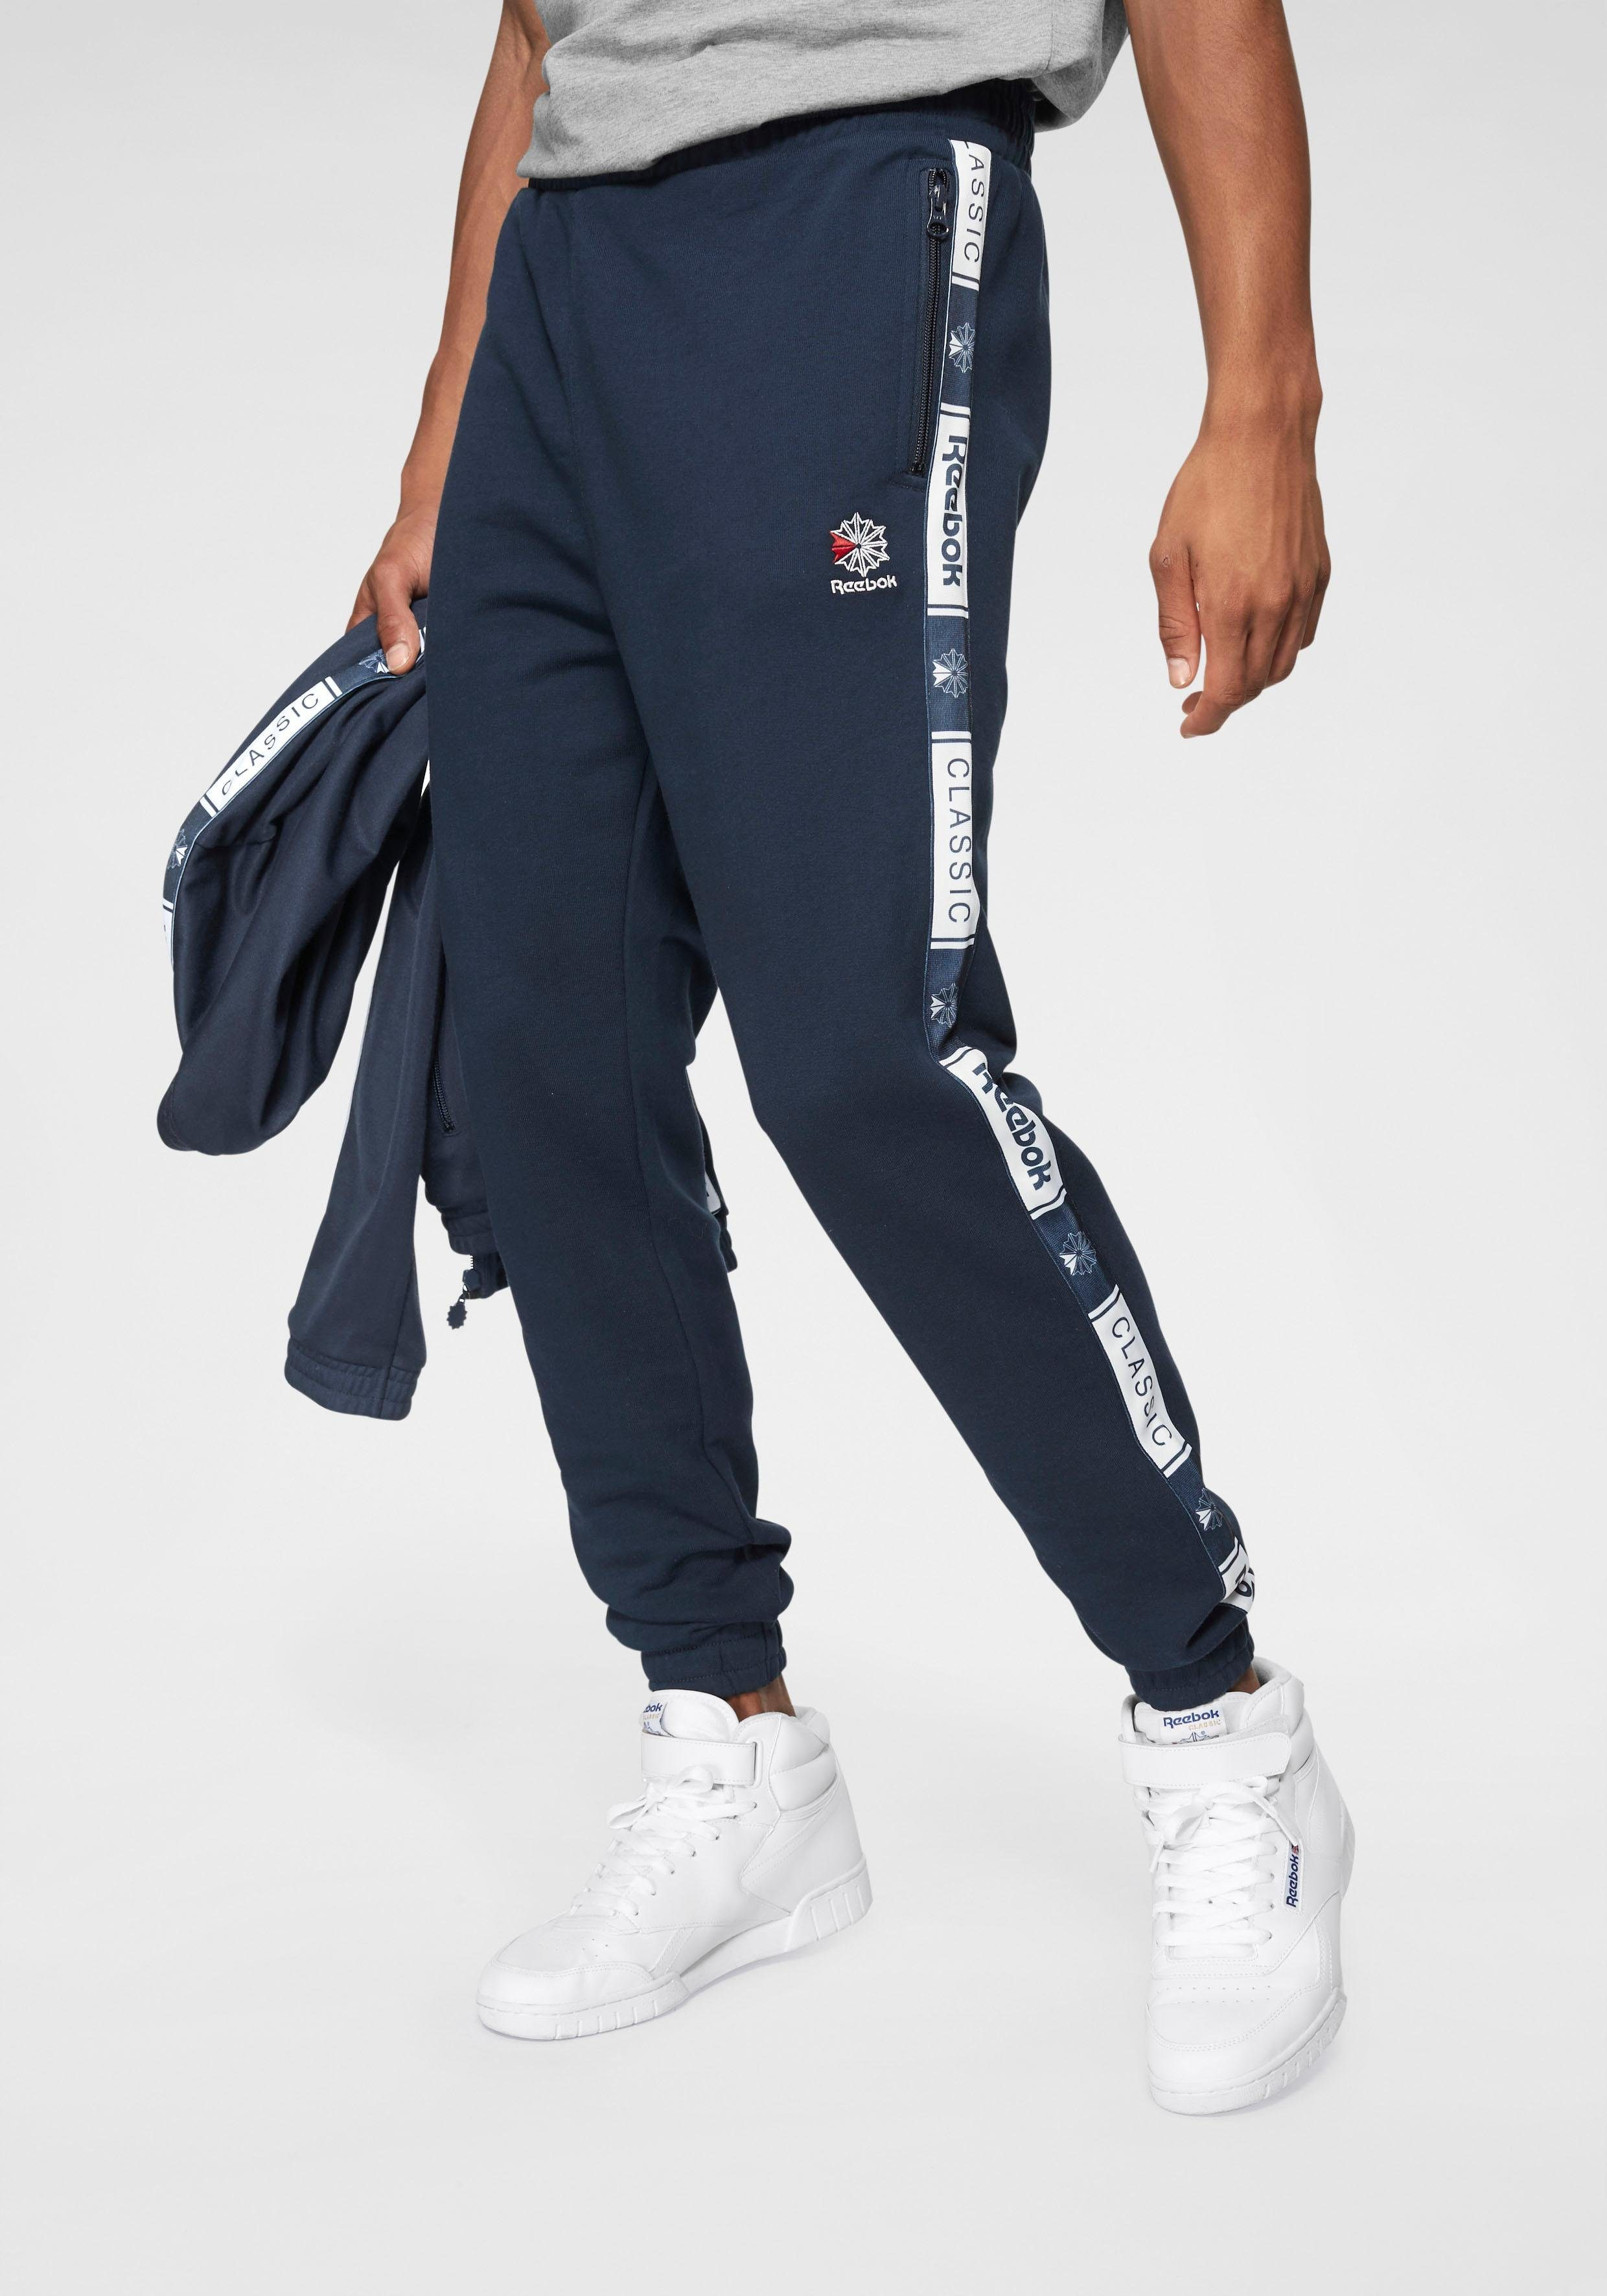 Reebok Classic Jogginghose »FT DIS PANT«, Jogginghose von Reebok online kaufen | OTTO